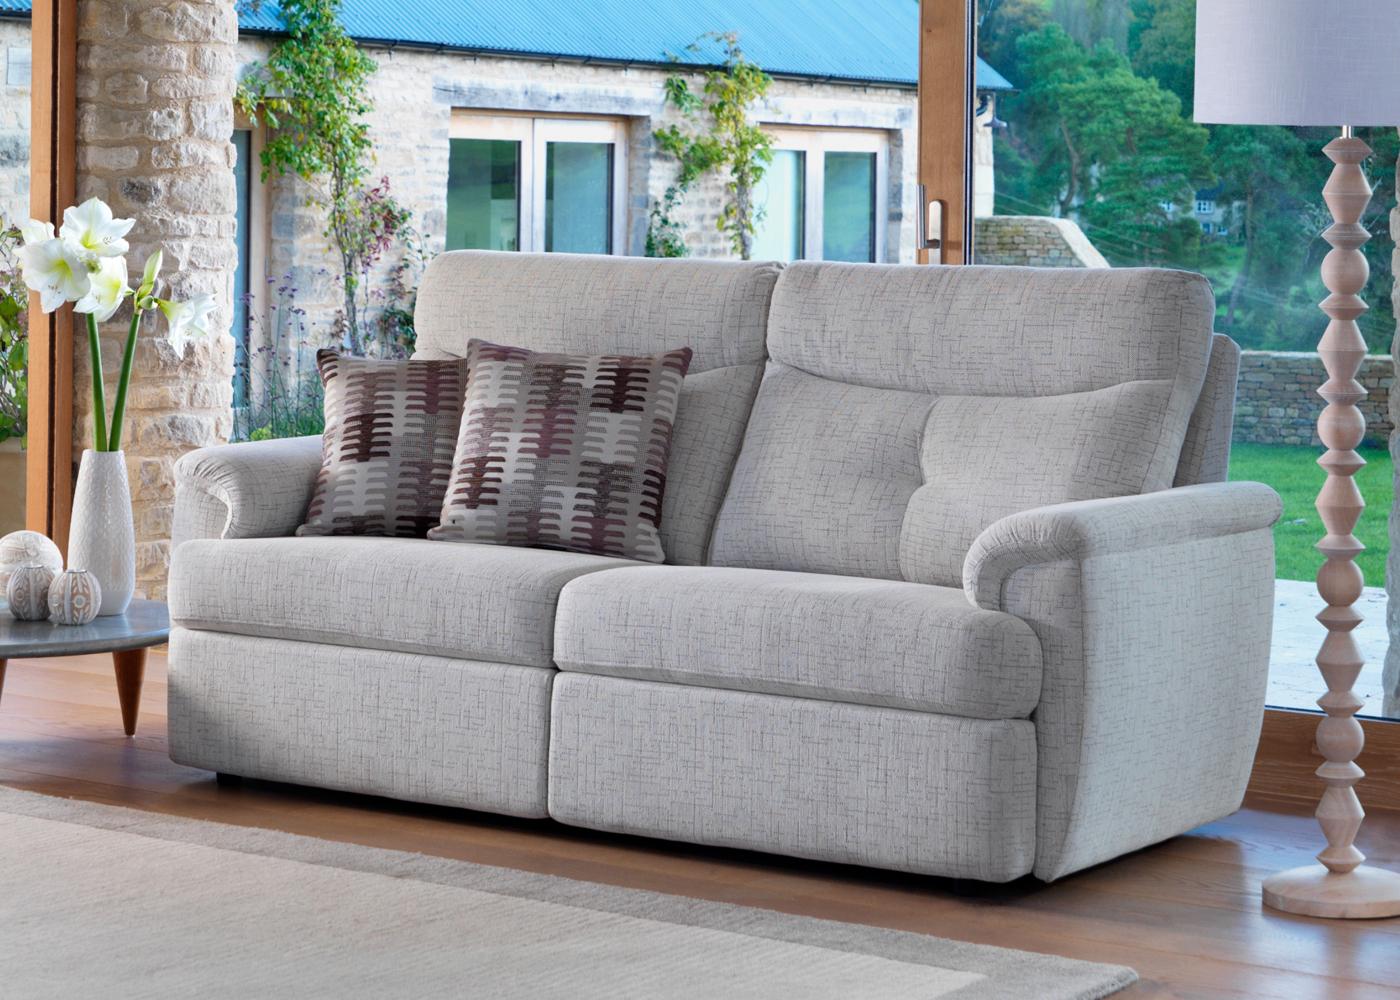 sofas in atlanta michael jackson sofa g plan 3 seater recliner midfurn furniture